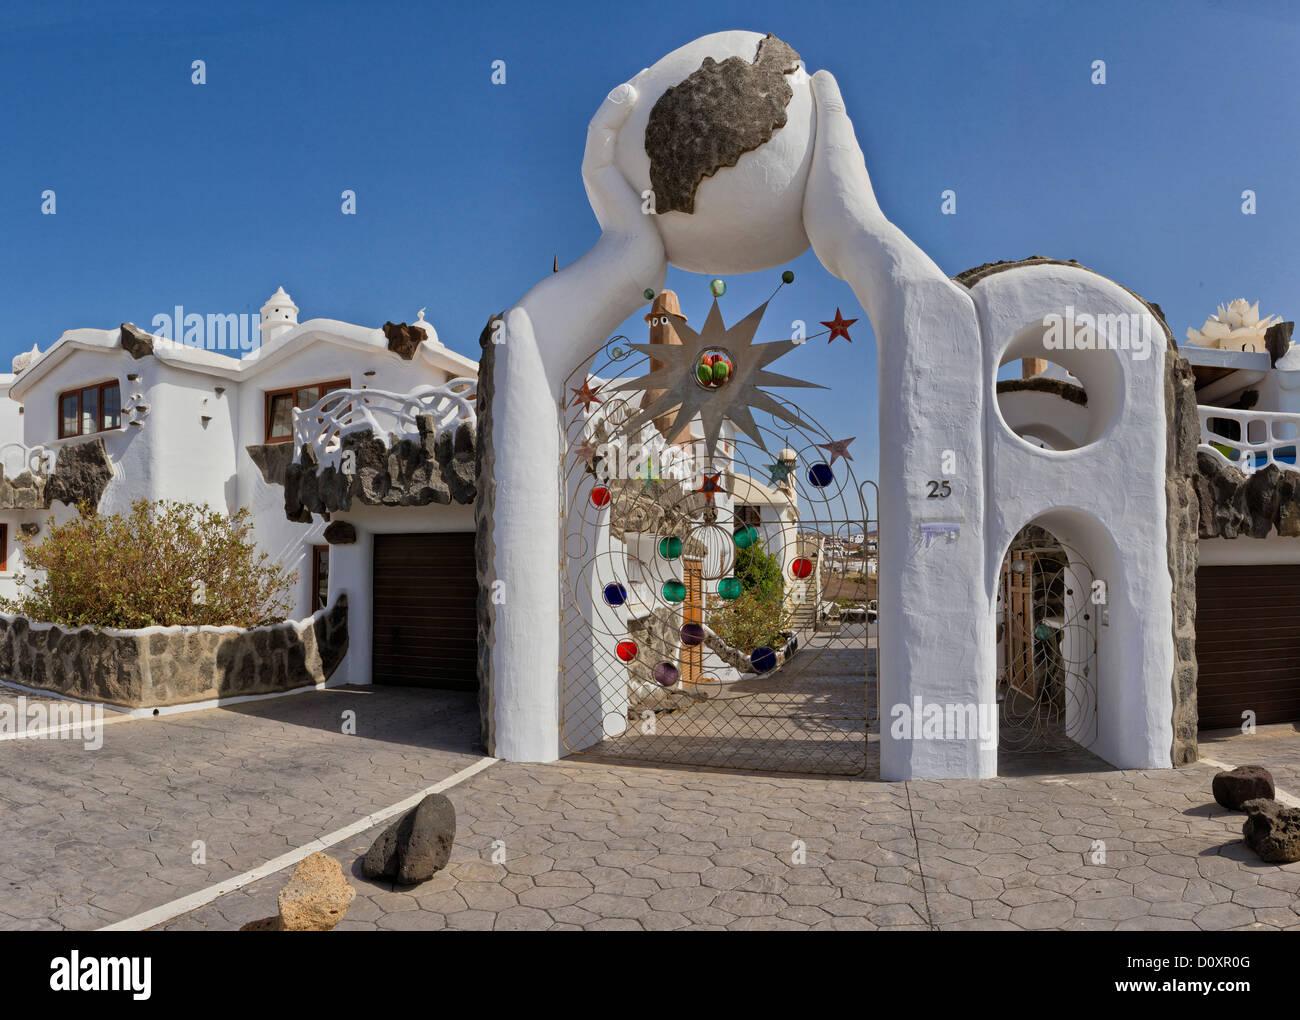 Buy A House Canary Islands